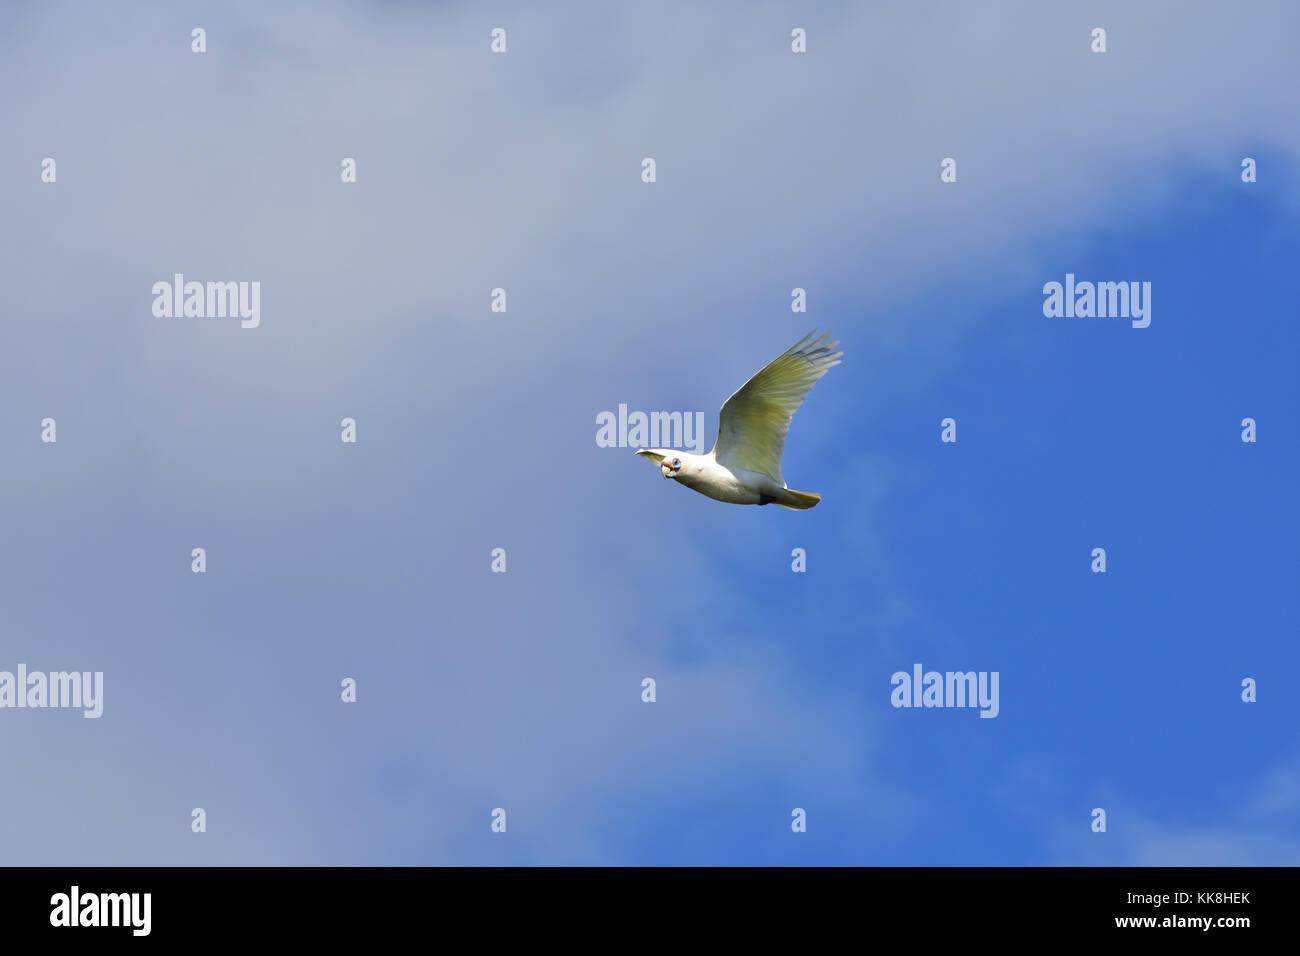 An Australian Long-billed Corella flying Stock Photo